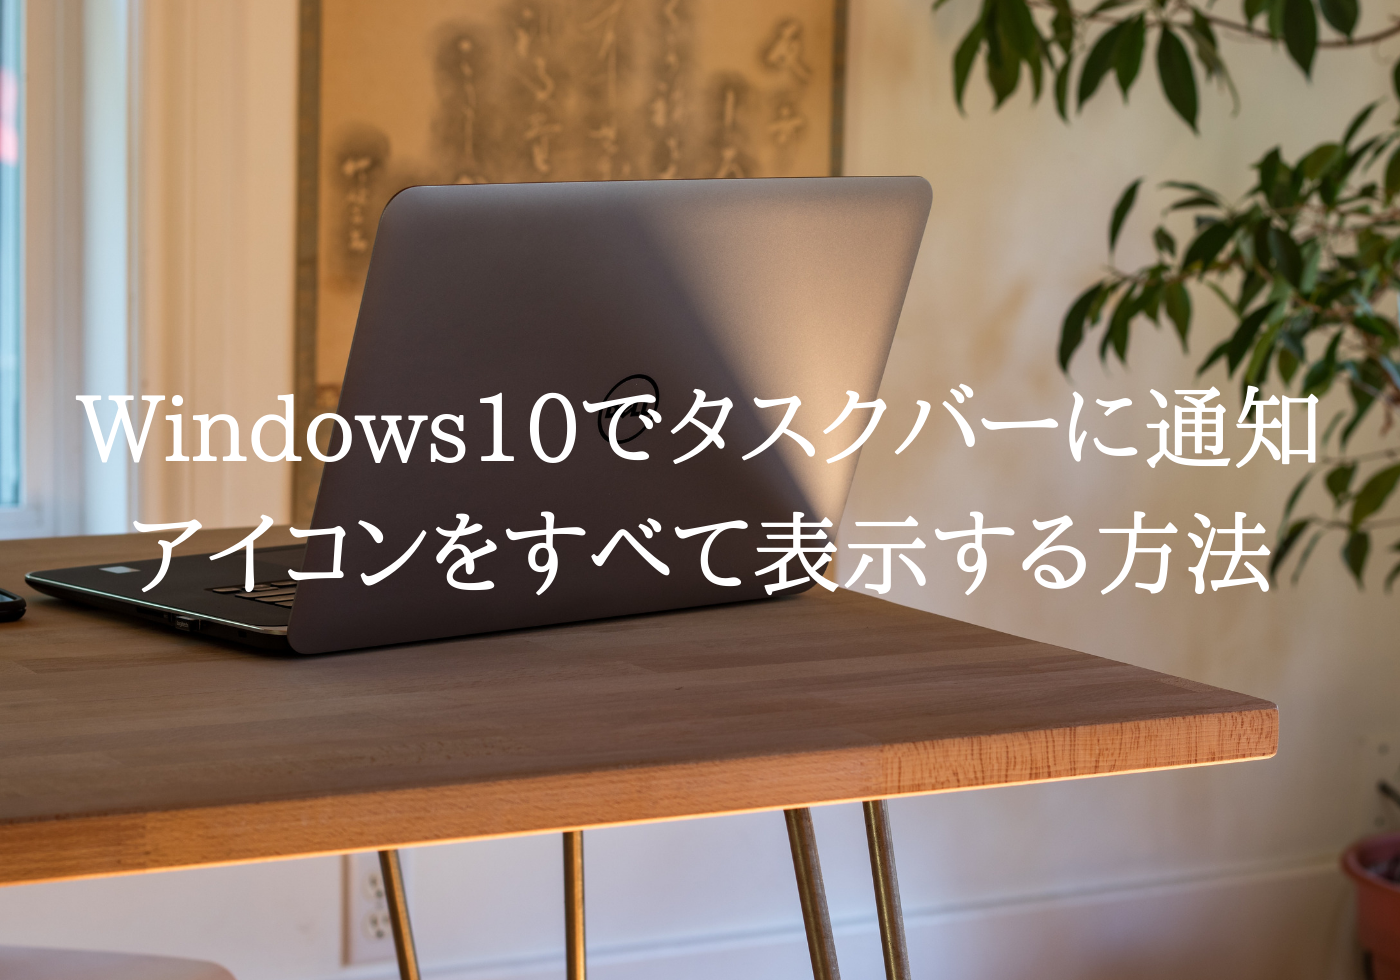 Windows10でタスクバーに通知アイコンをすべて表示する方法